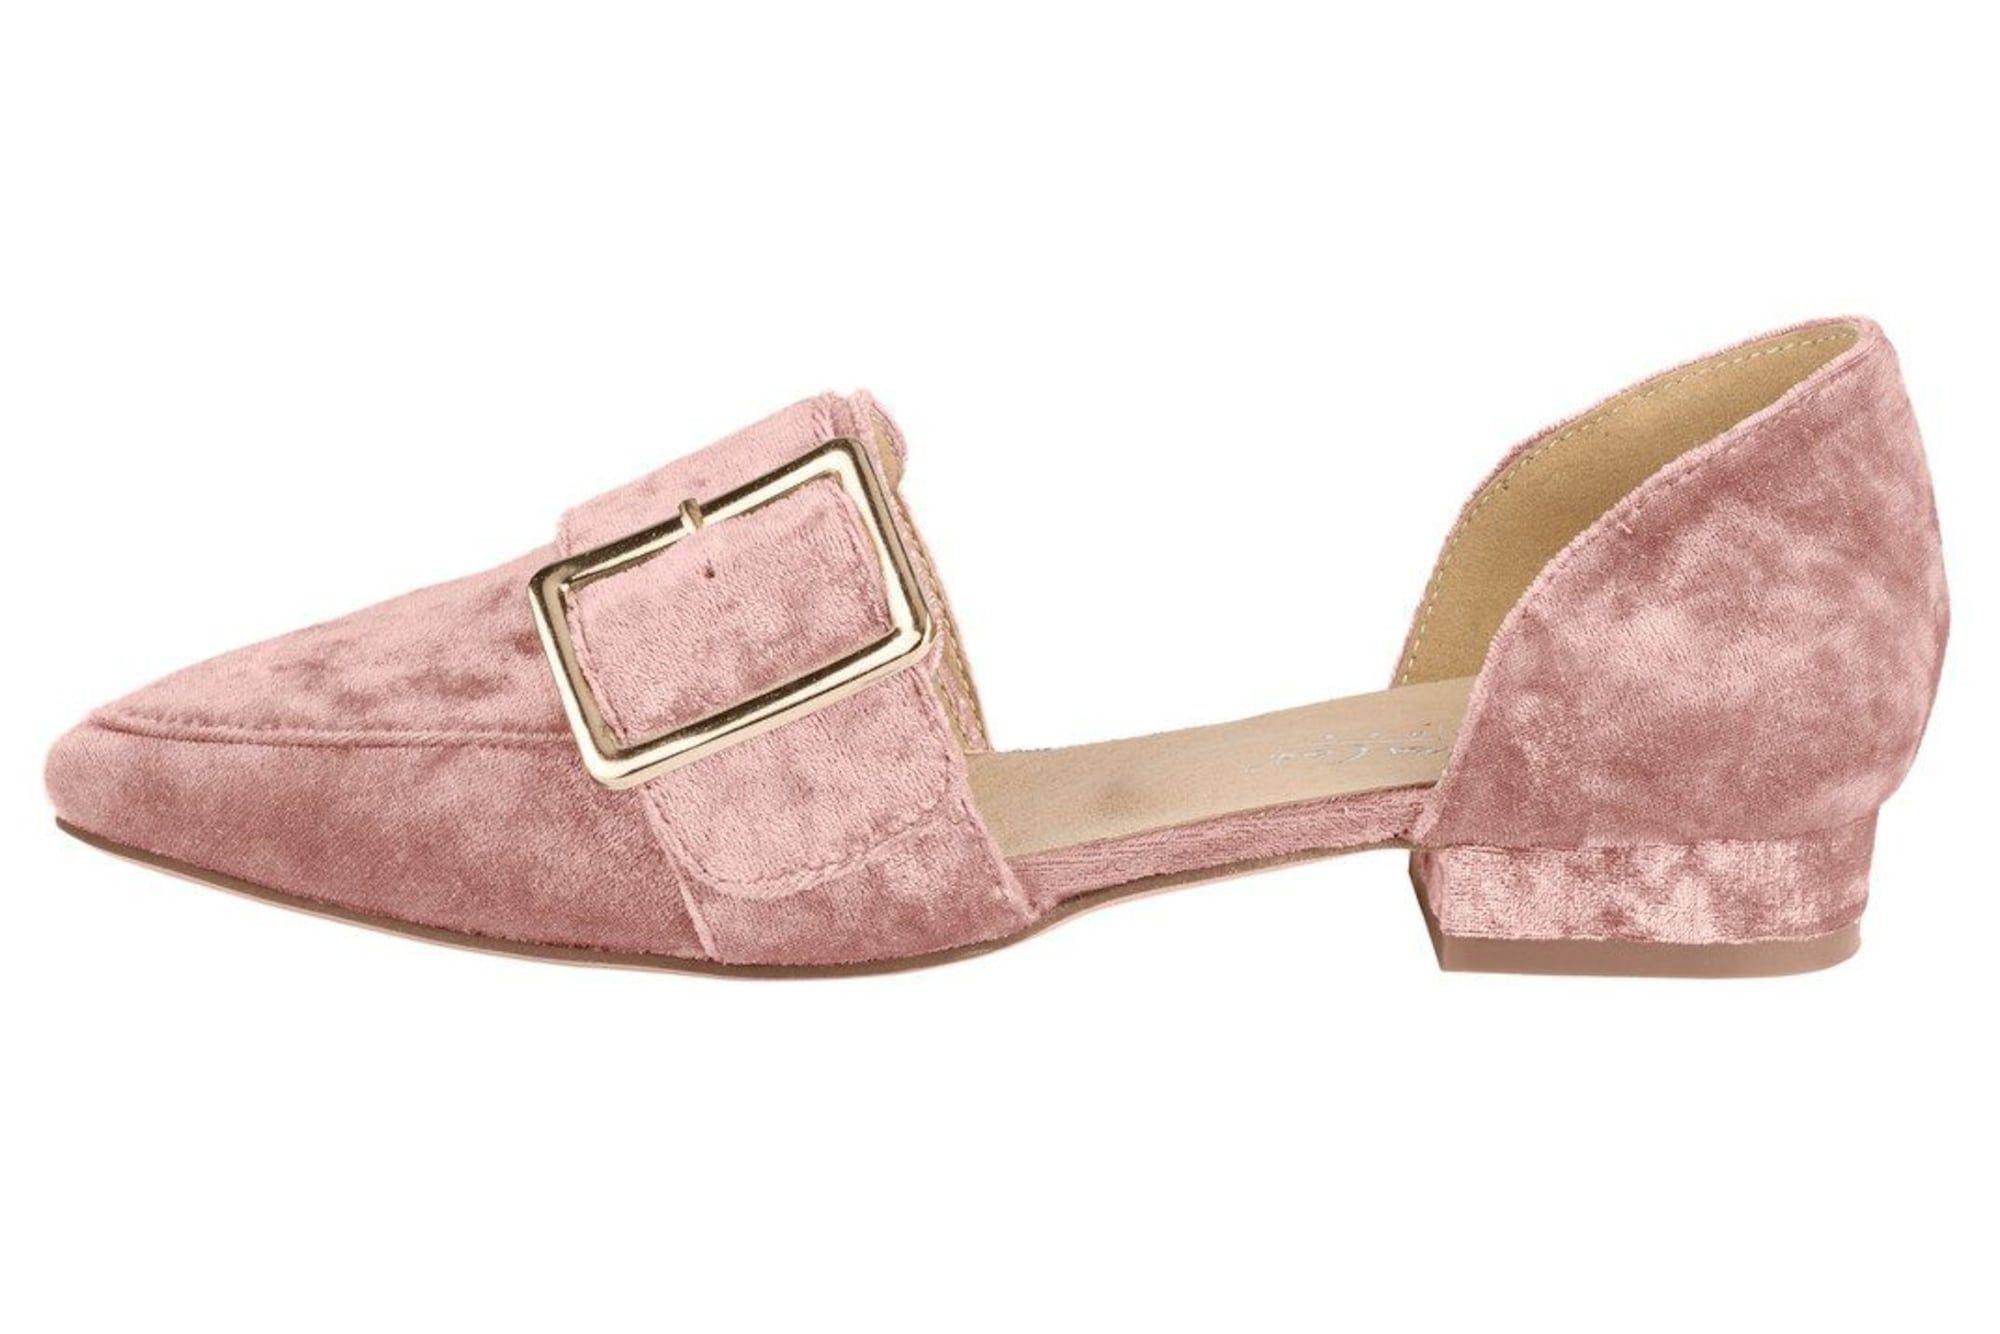 Camper Sneaker Altrosa Schuhe Fashion Shoes Sneakers Schuhe Frauen Frauenschuhe Sneakers Schuhe